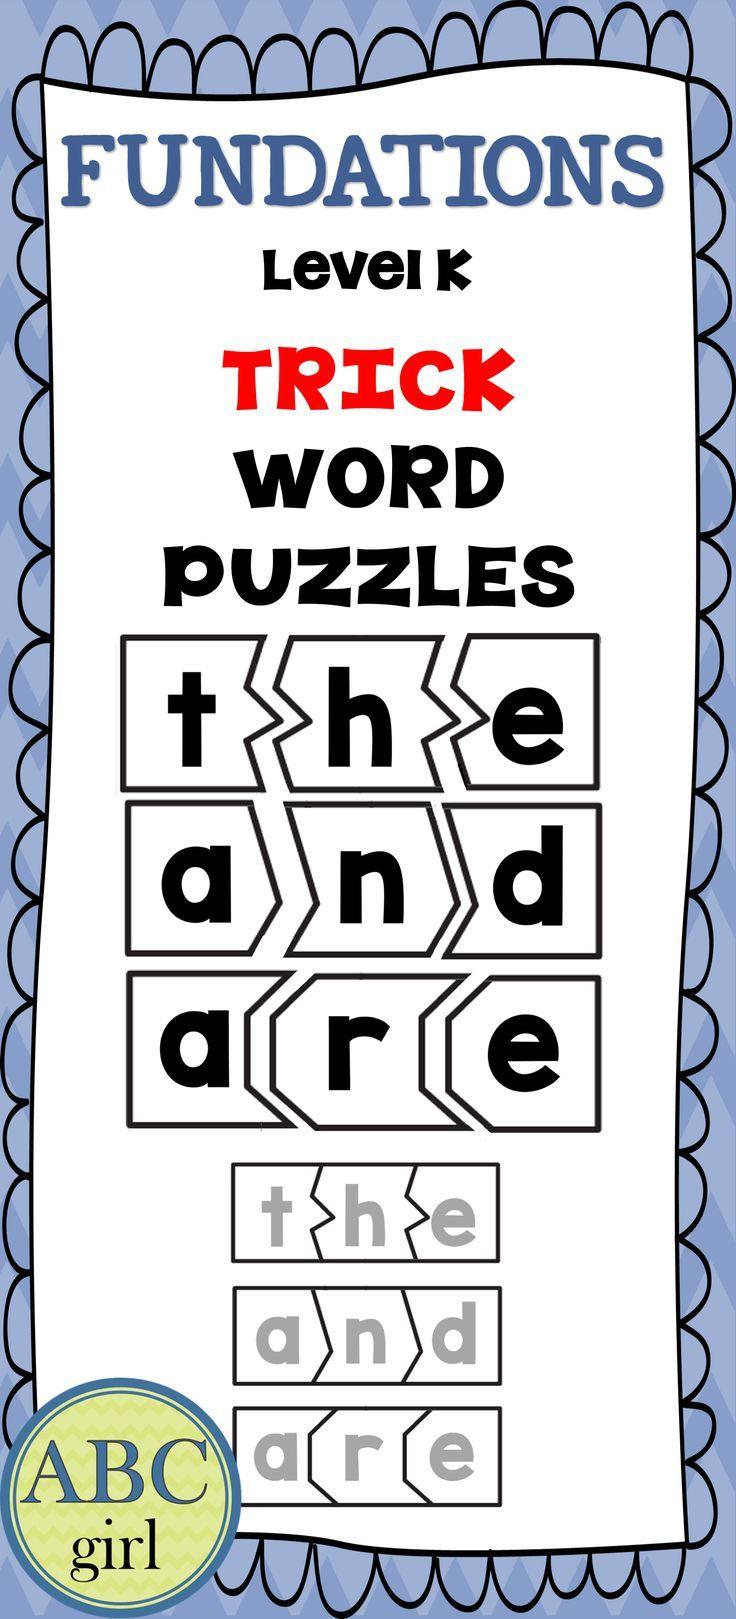 Kindergarten Fundationally FUN PHONICS Level K Trick Word